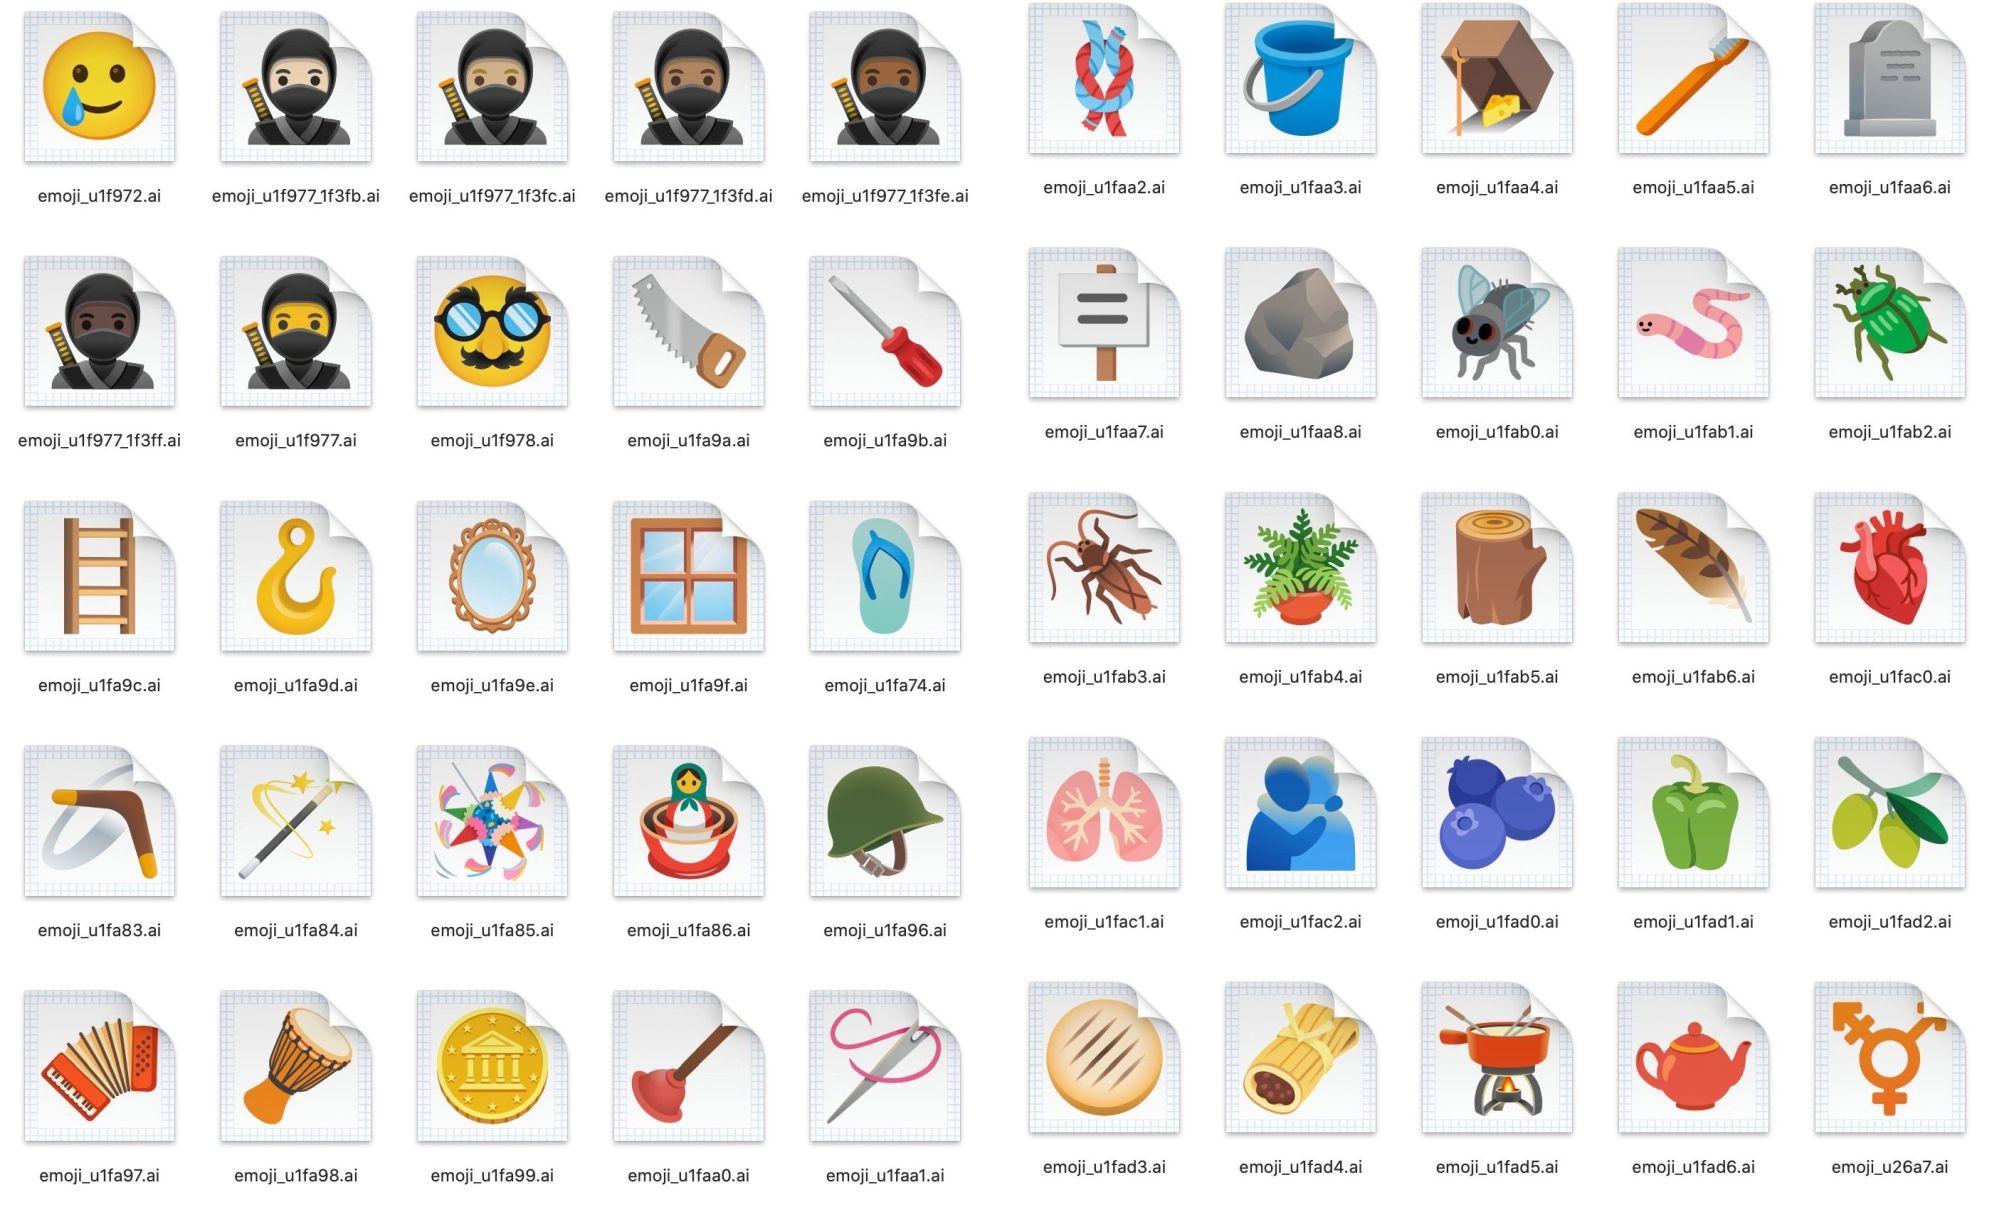 android 11 emojis 1